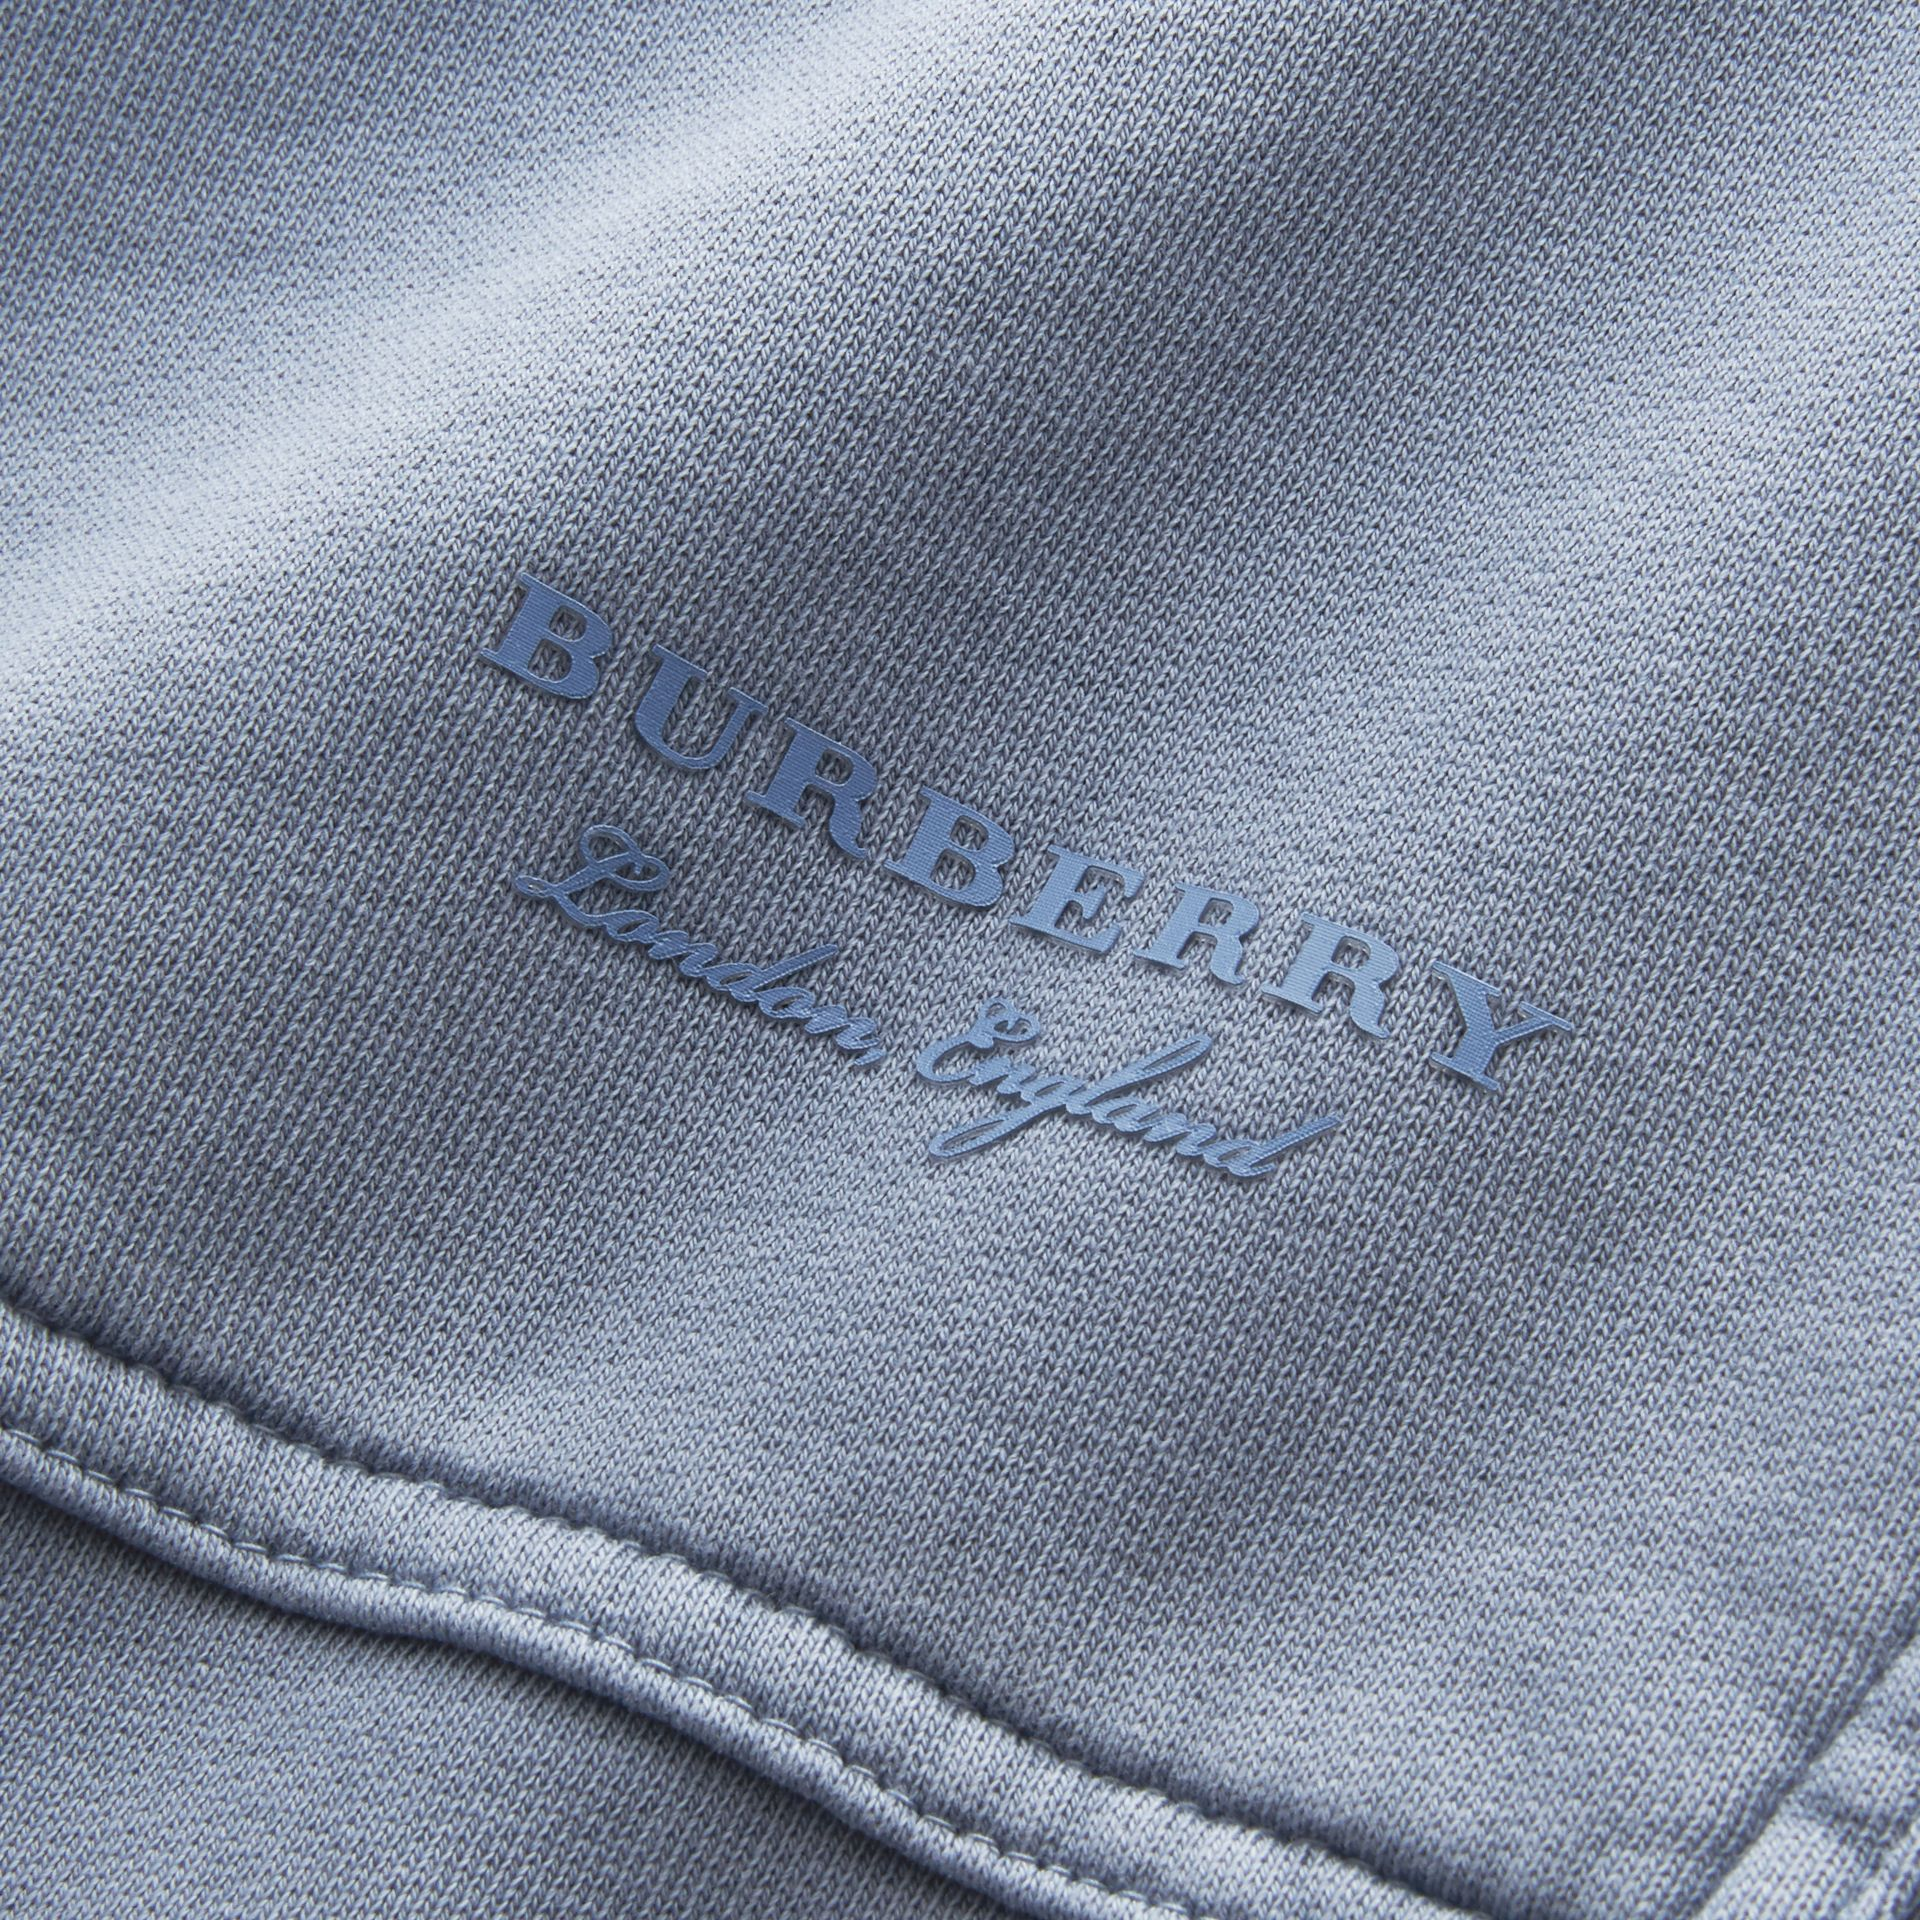 Unisex Pigment-dyed Cotton Oversize Sweatshirt in Dusty Blue - Women | Burberry Singapore - gallery image 2